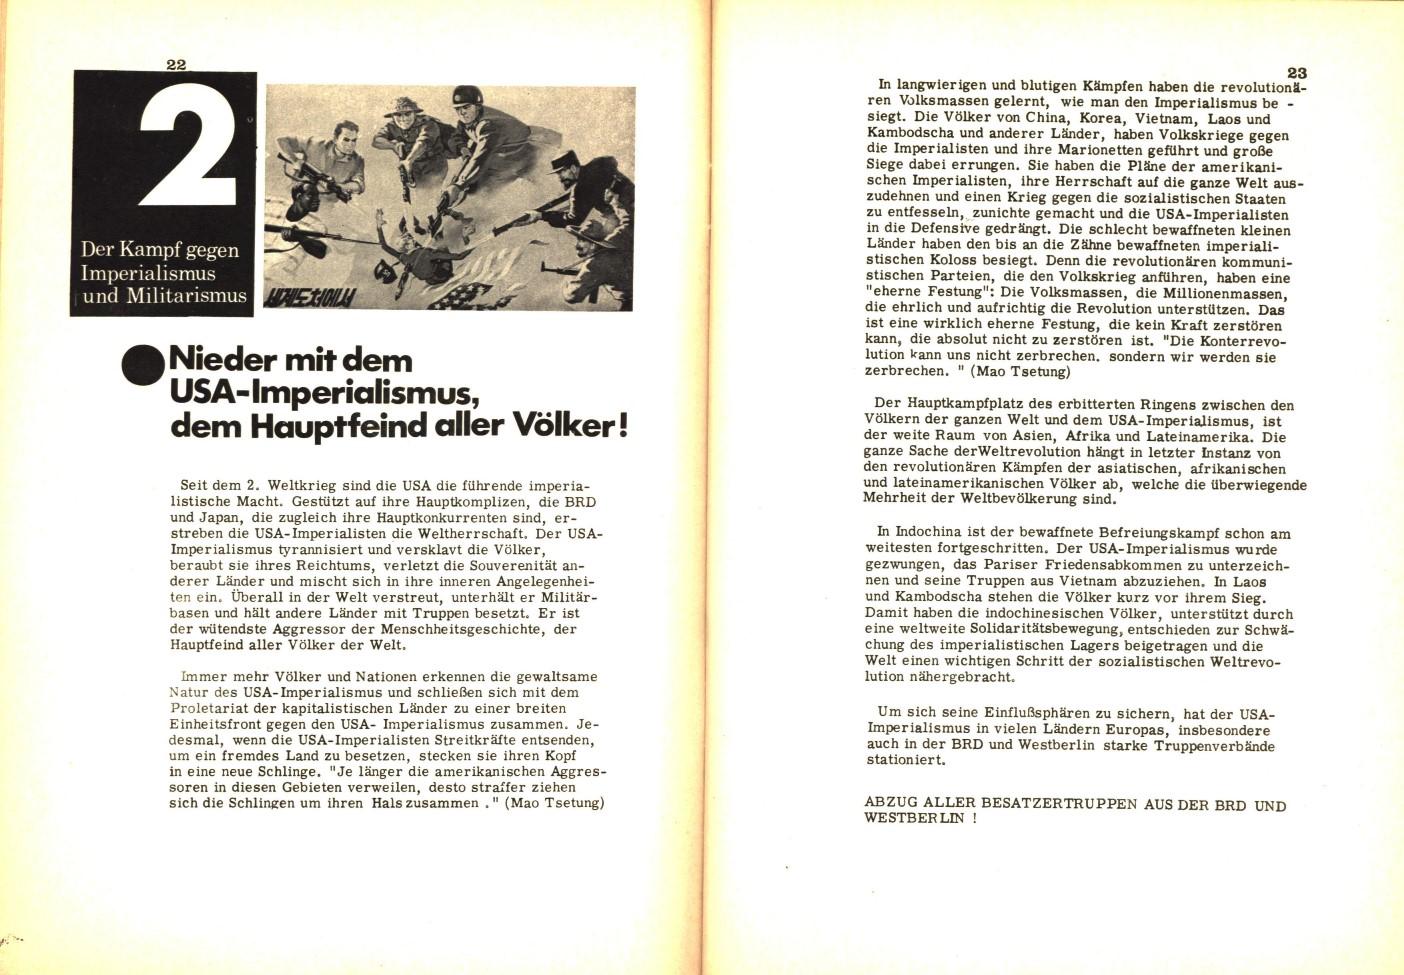 KOV_1973_Aktionsprogramm_14